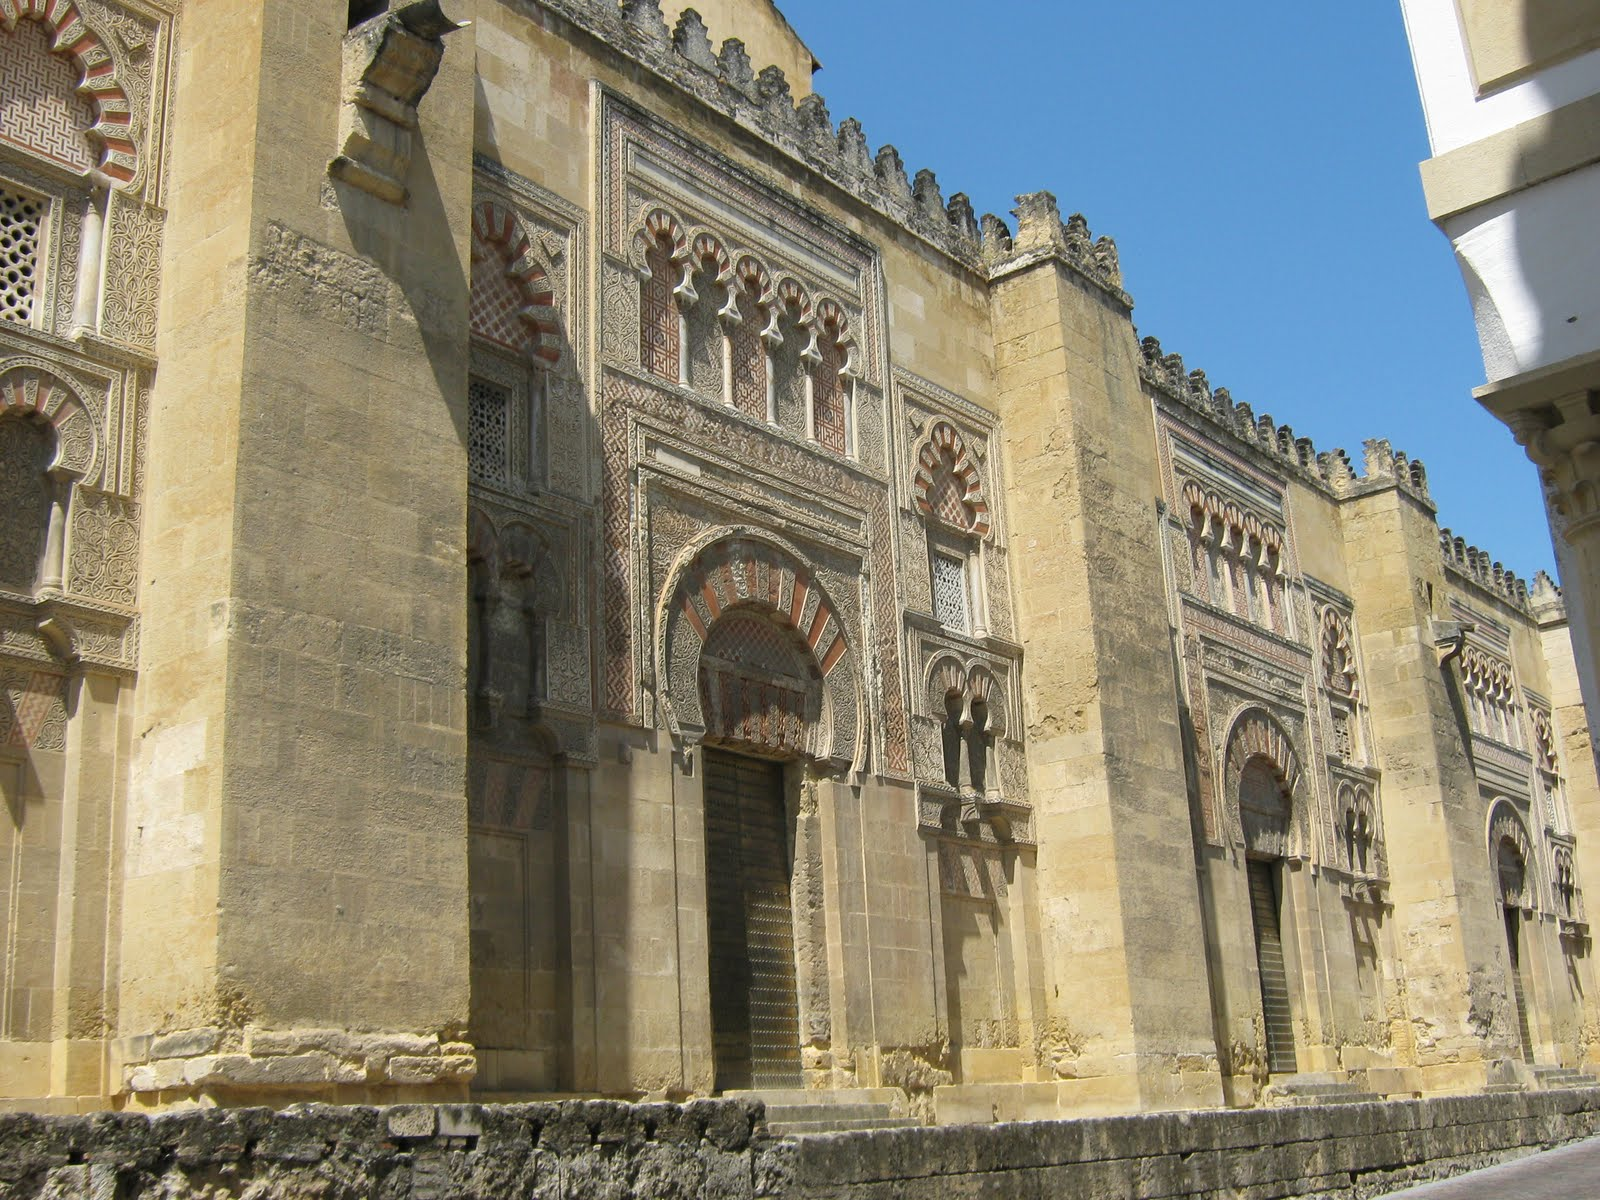 Calipso la mezquita de c rdoba for Exterior mezquita de cordoba